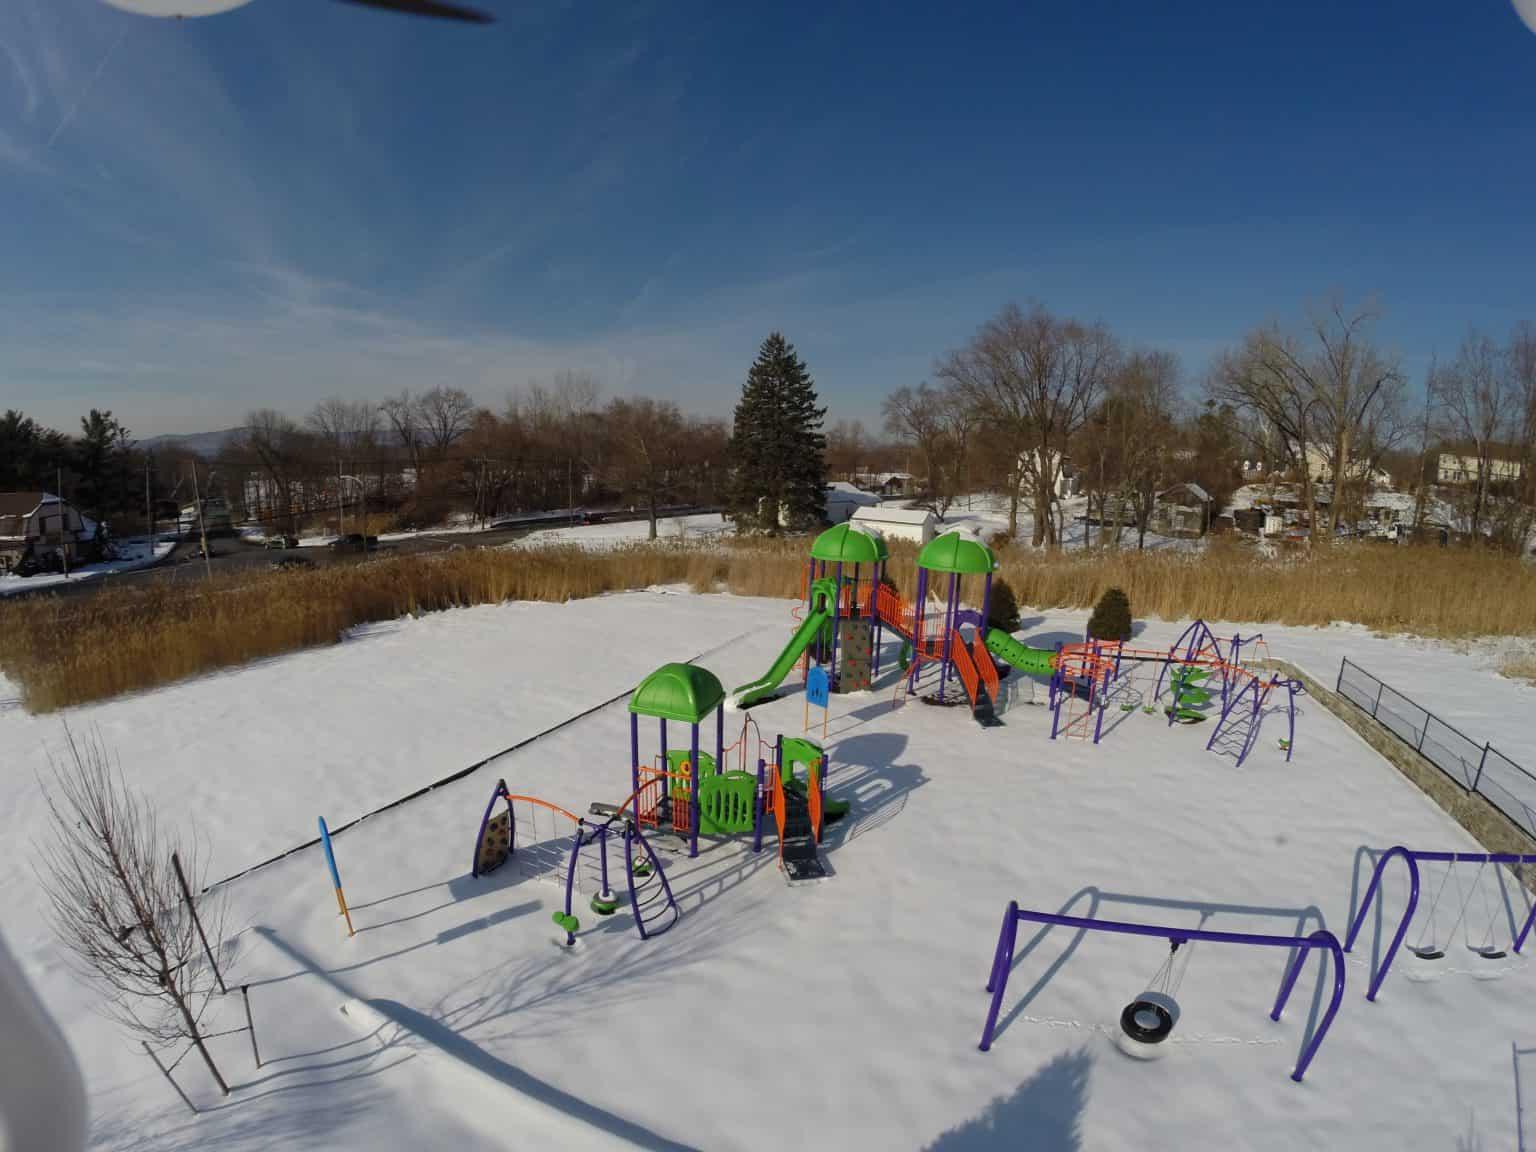 wiss-park-playground-wayne-nj_11652966694_o-1536x1152